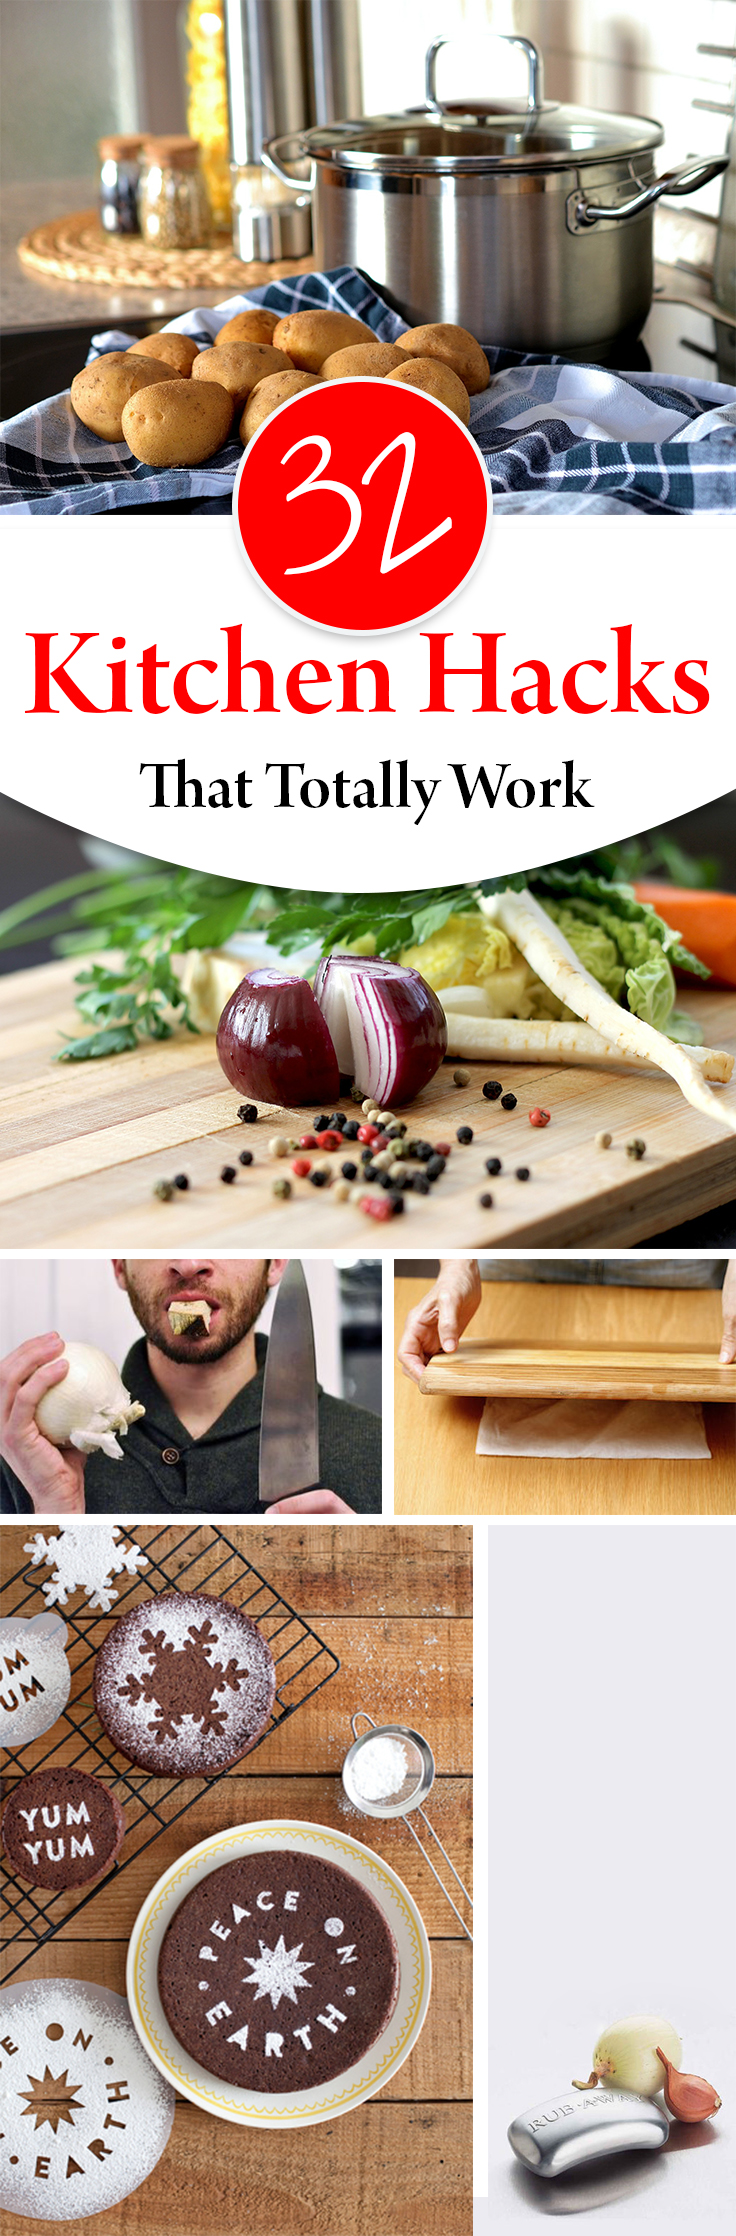 32 Kitchen Hacks That Totally Work